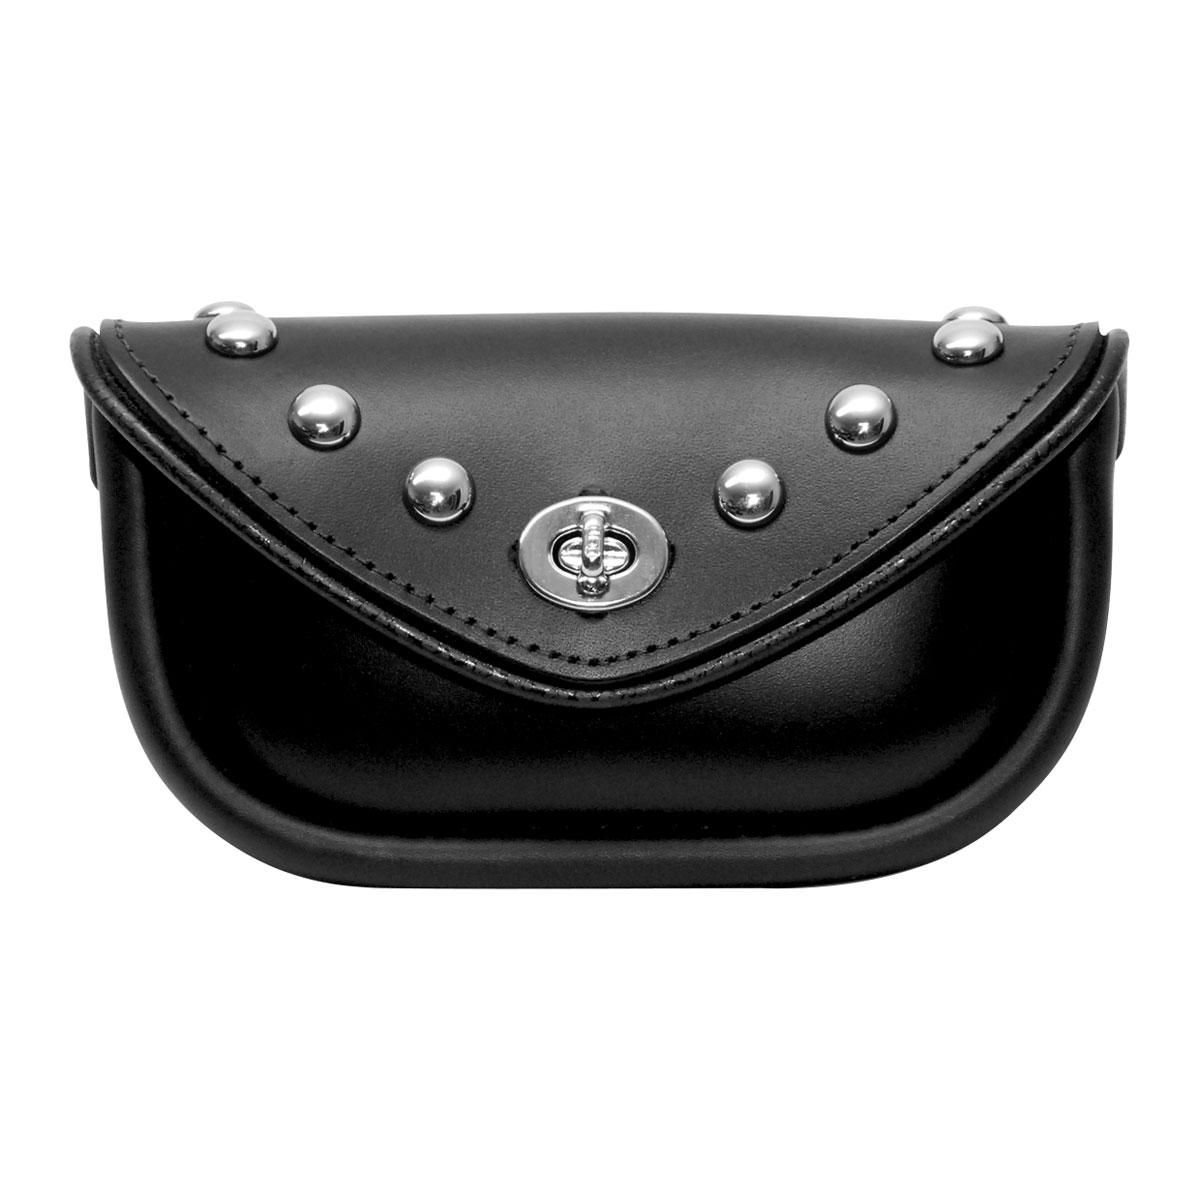 Leatherworks, Inc. Studded Handlebar Bag